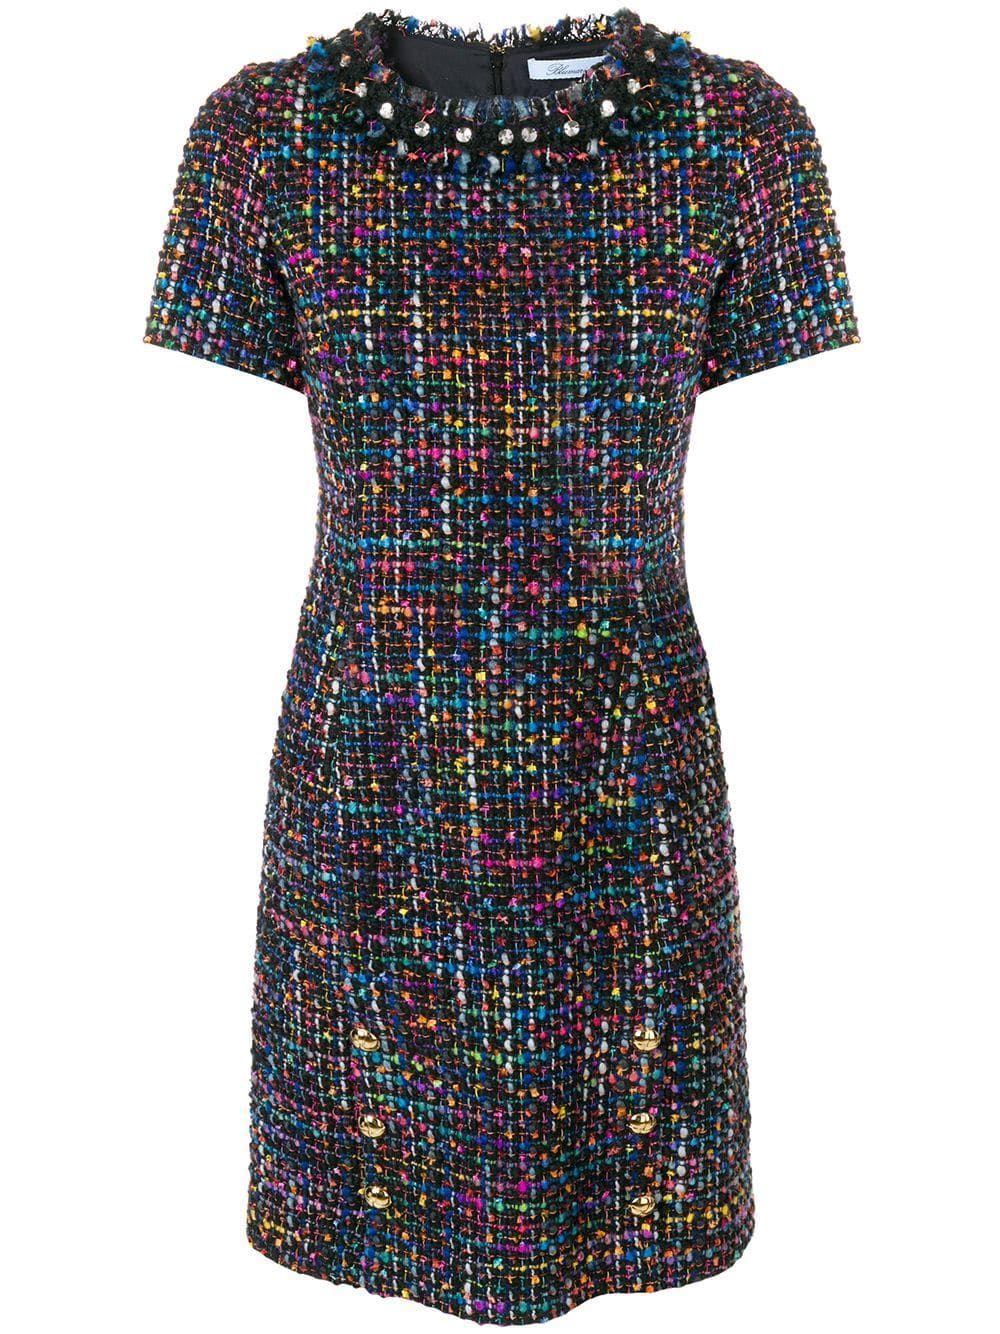 Blumarine Tweed Dress Rochii In 2019 Dresses Tweed